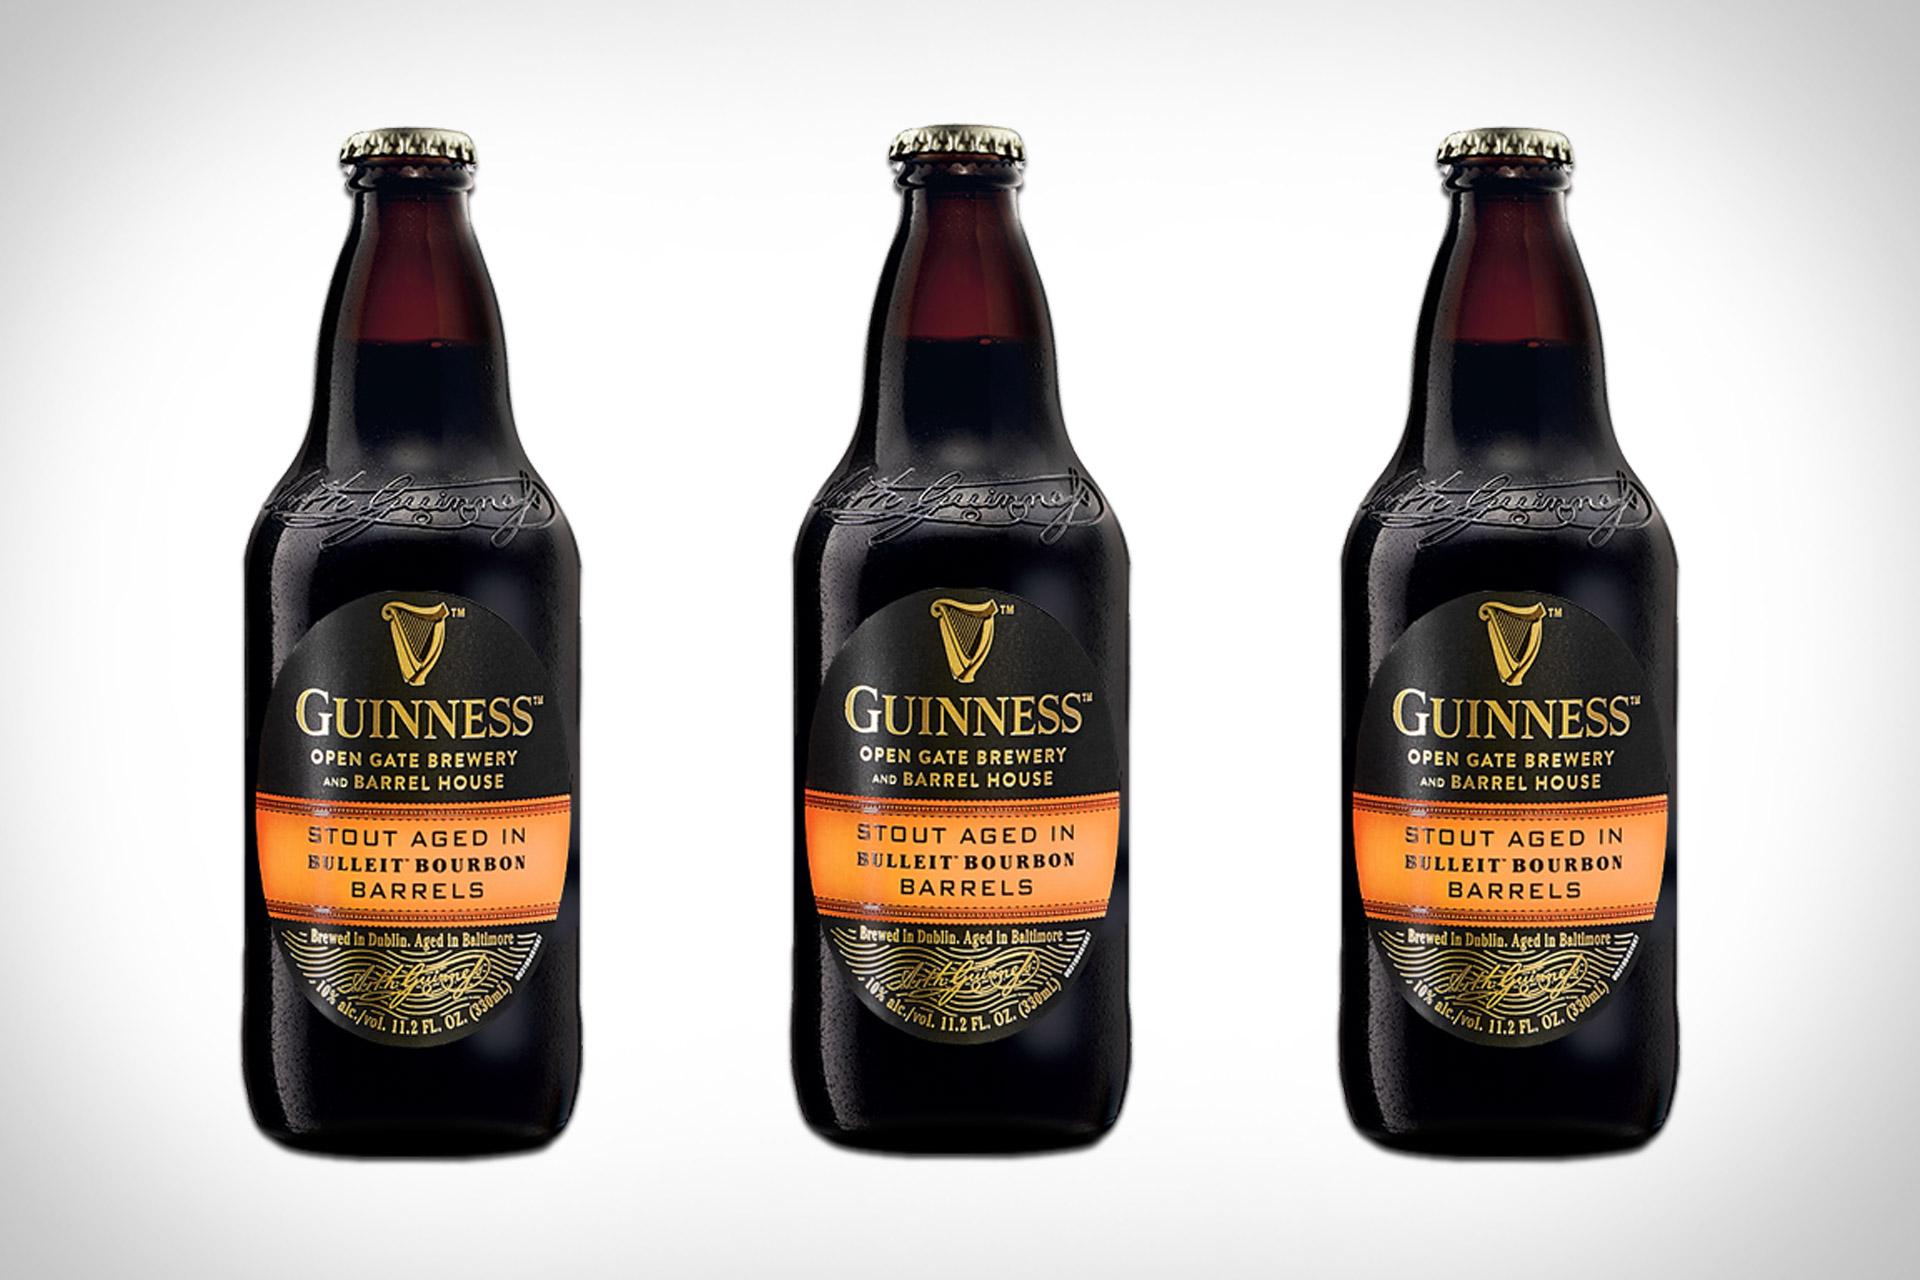 Guinness Bourbon Barrel Stout